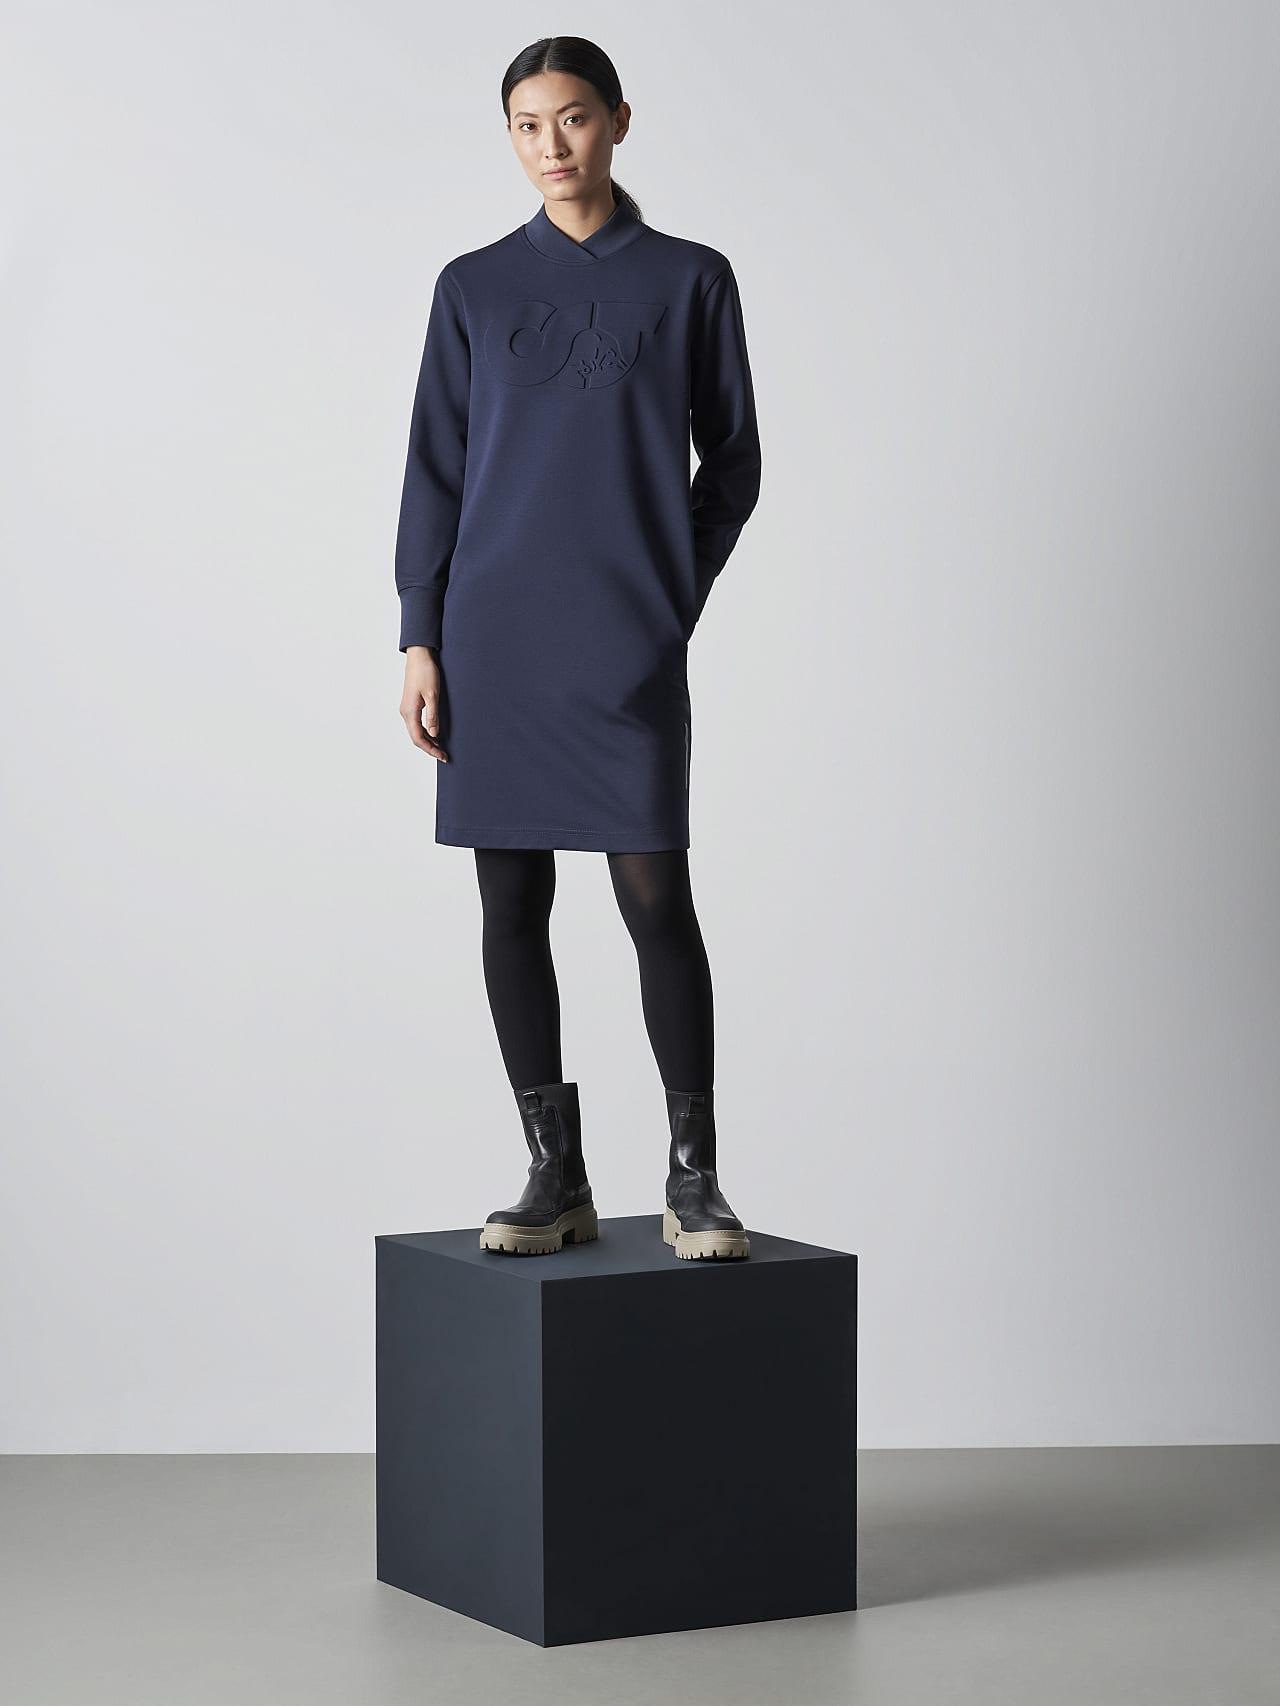 STAR V3.Y5.02 Premium Logo Sweater Dress navy Front Alpha Tauri